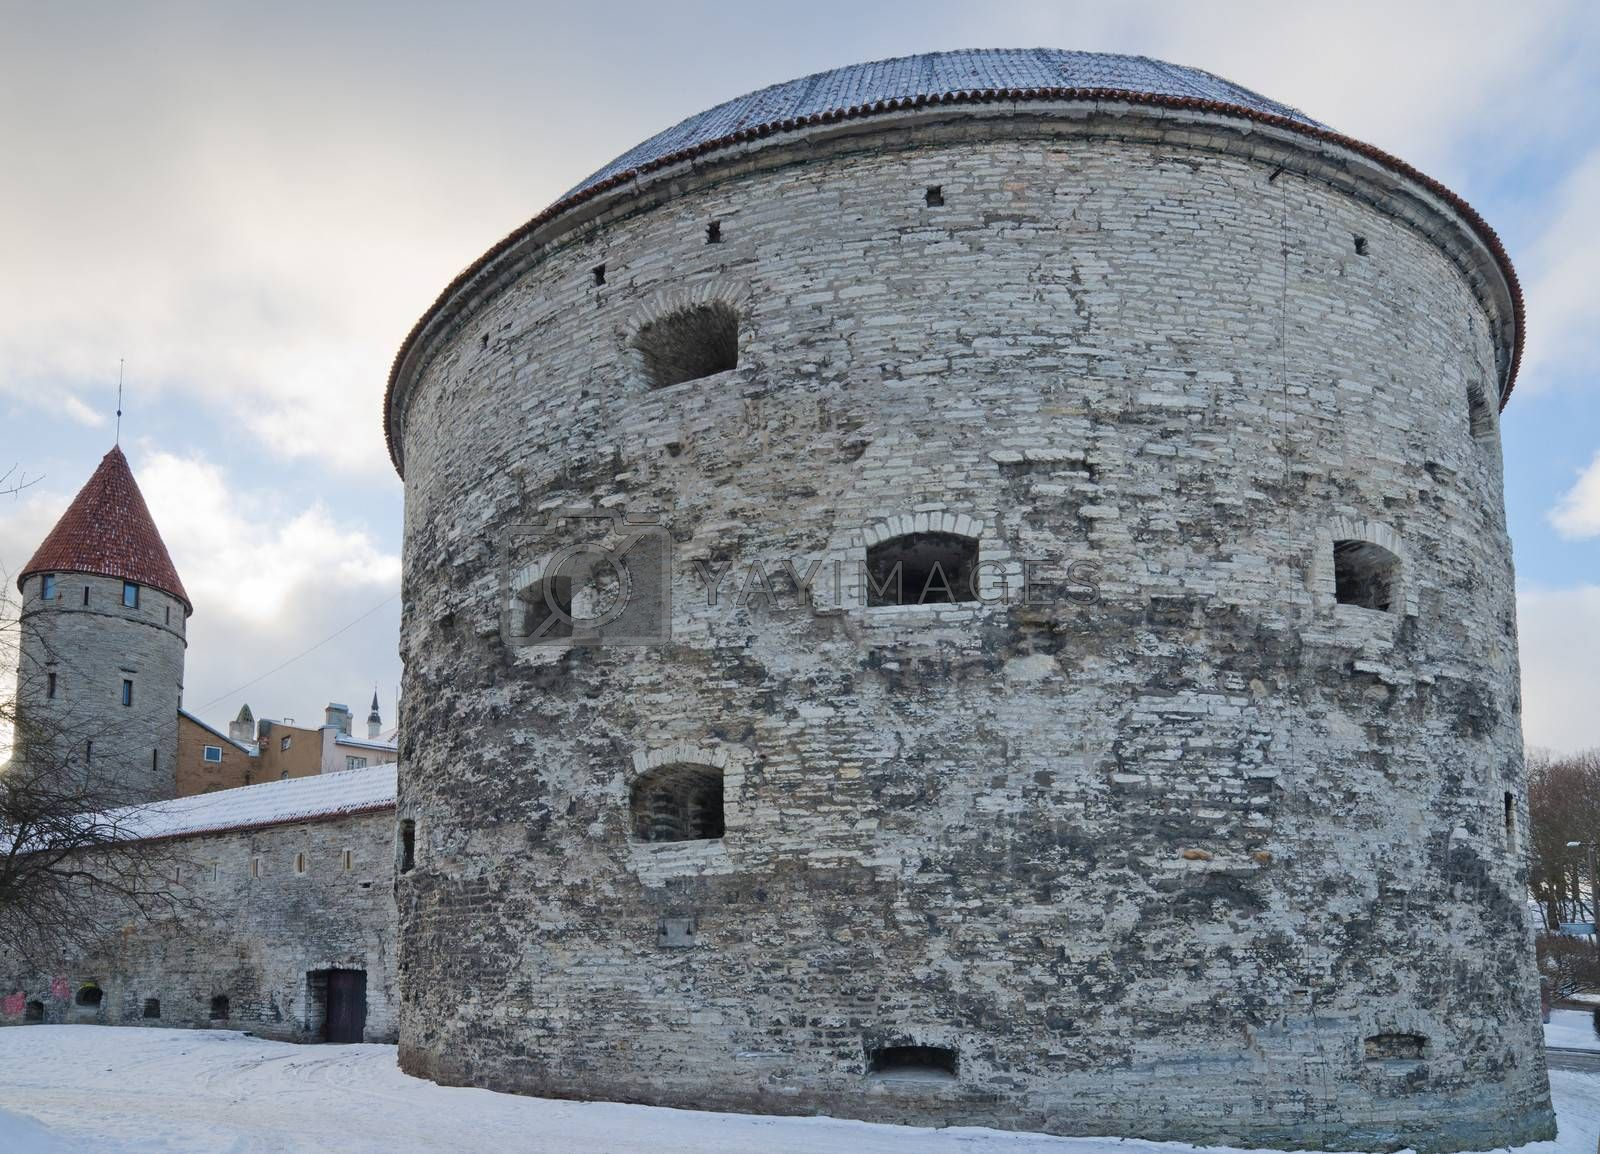 Medieval tower Thick Margarita in Tallinn